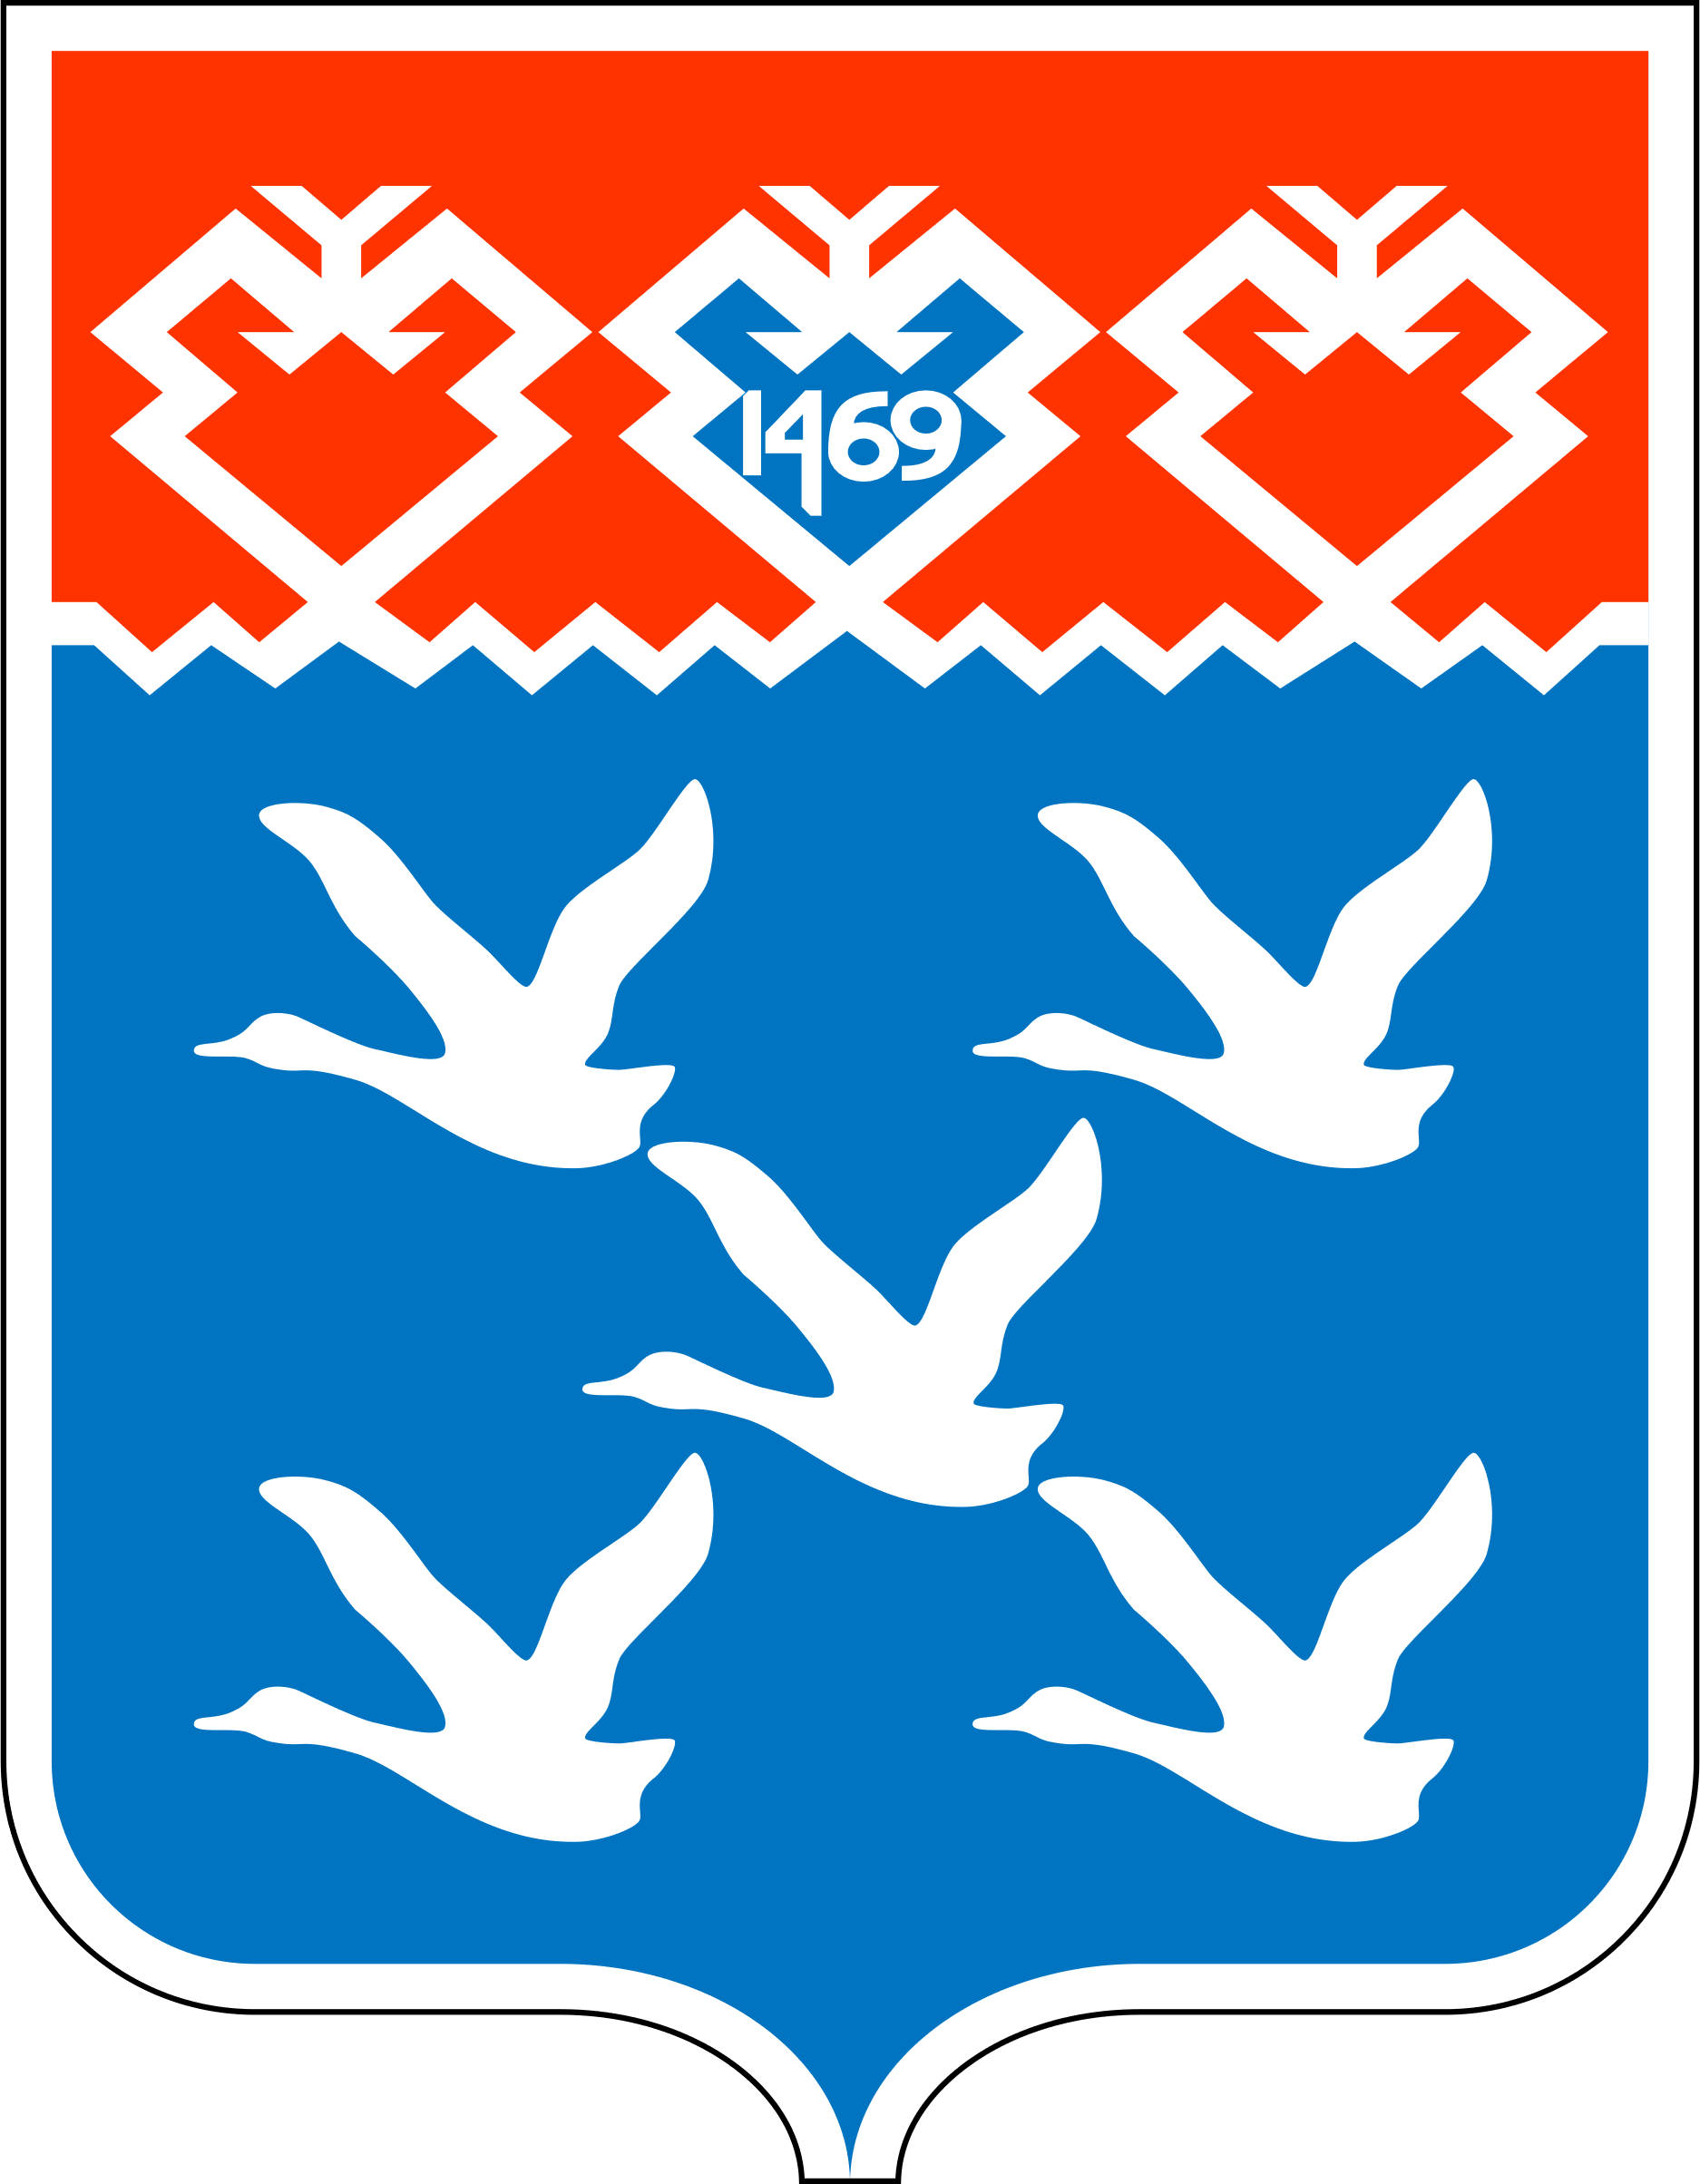 Герб города Чебоксары